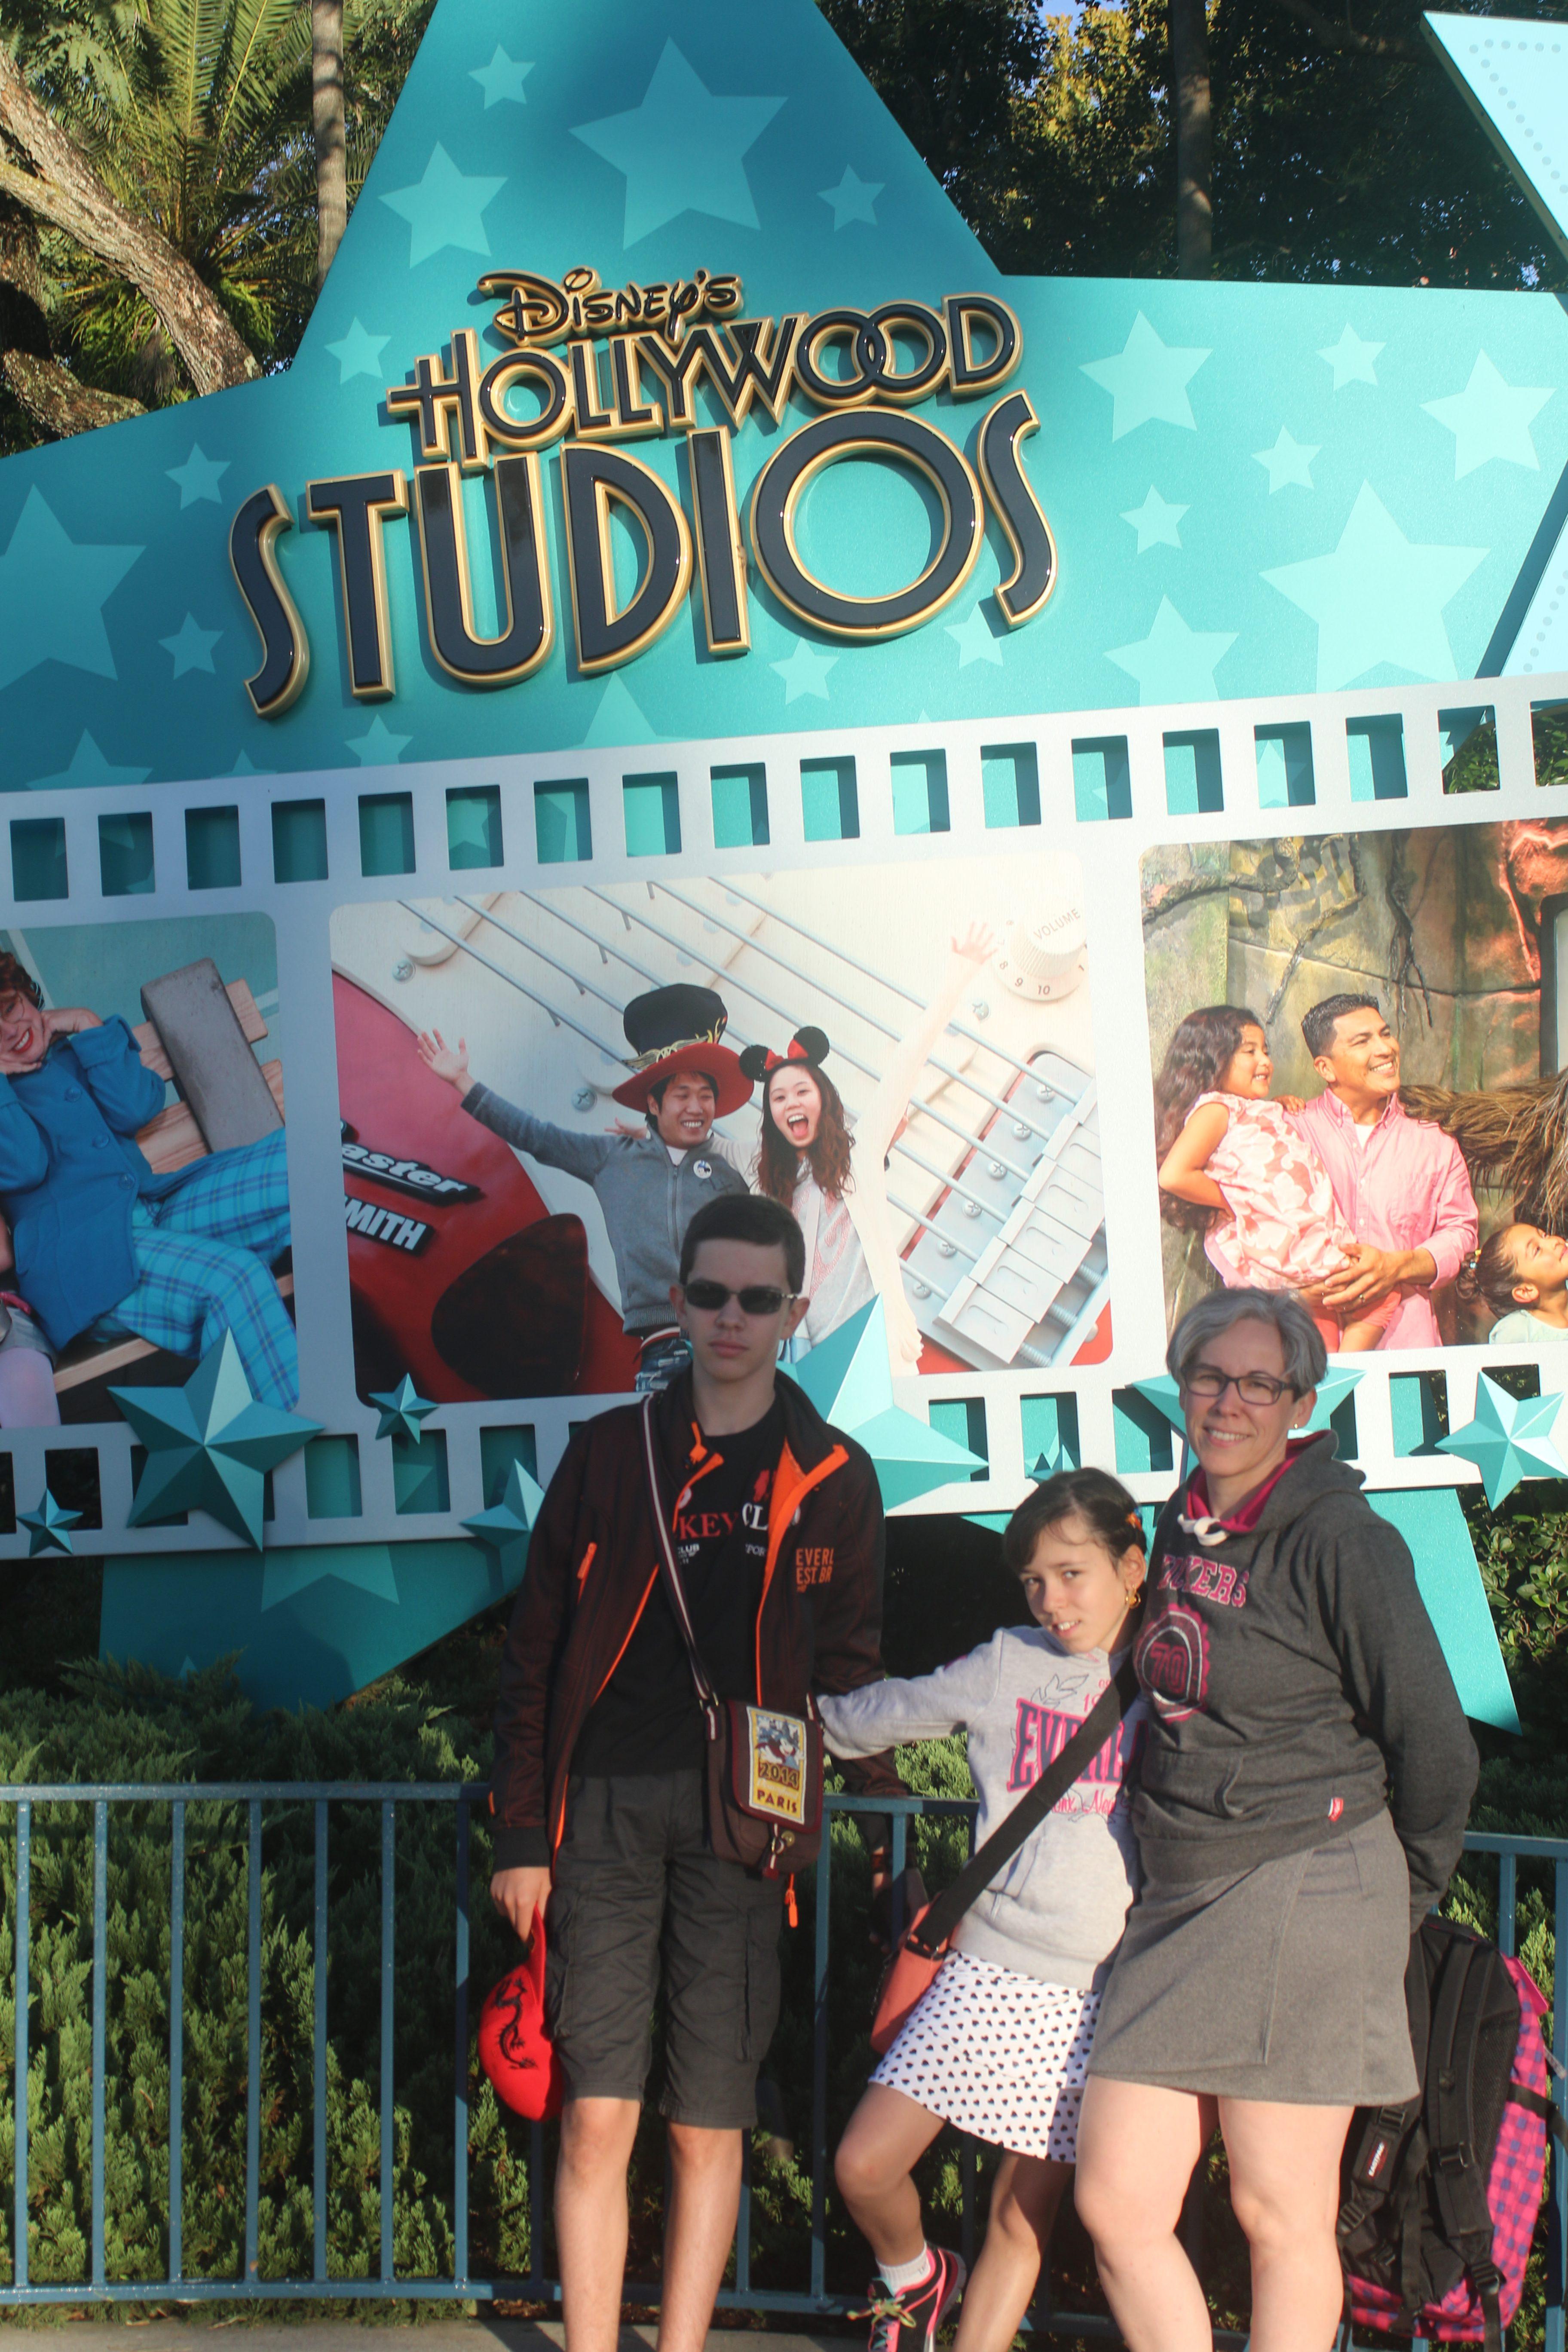 Chroniques de Disneyworld, Jour 5: Disney's Hollywood Studios